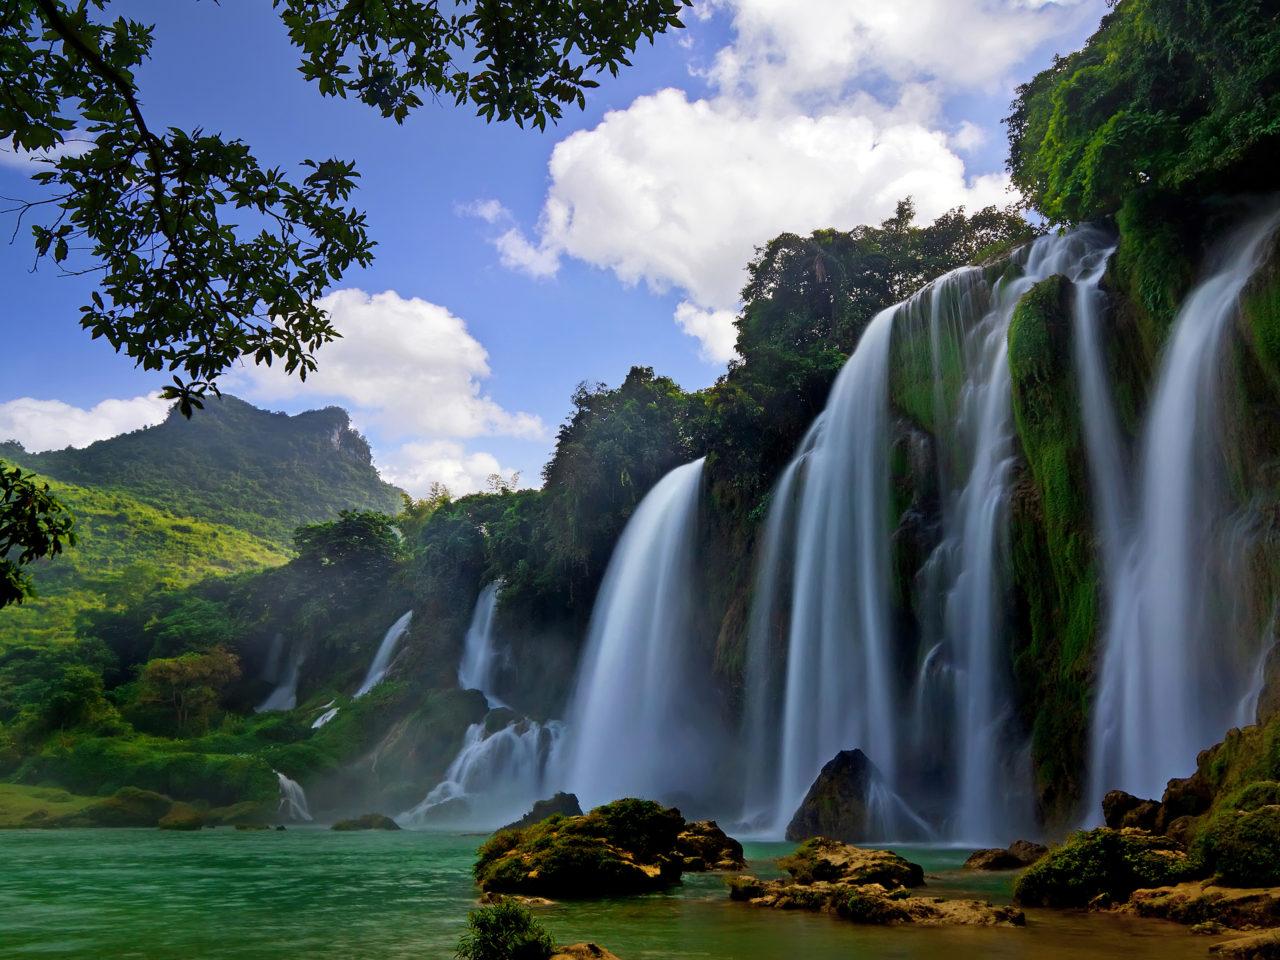 Iphone Wallpaper Waterfall Ban Gioc Detian Falls Cao Bang Province China Hd Wallpaper